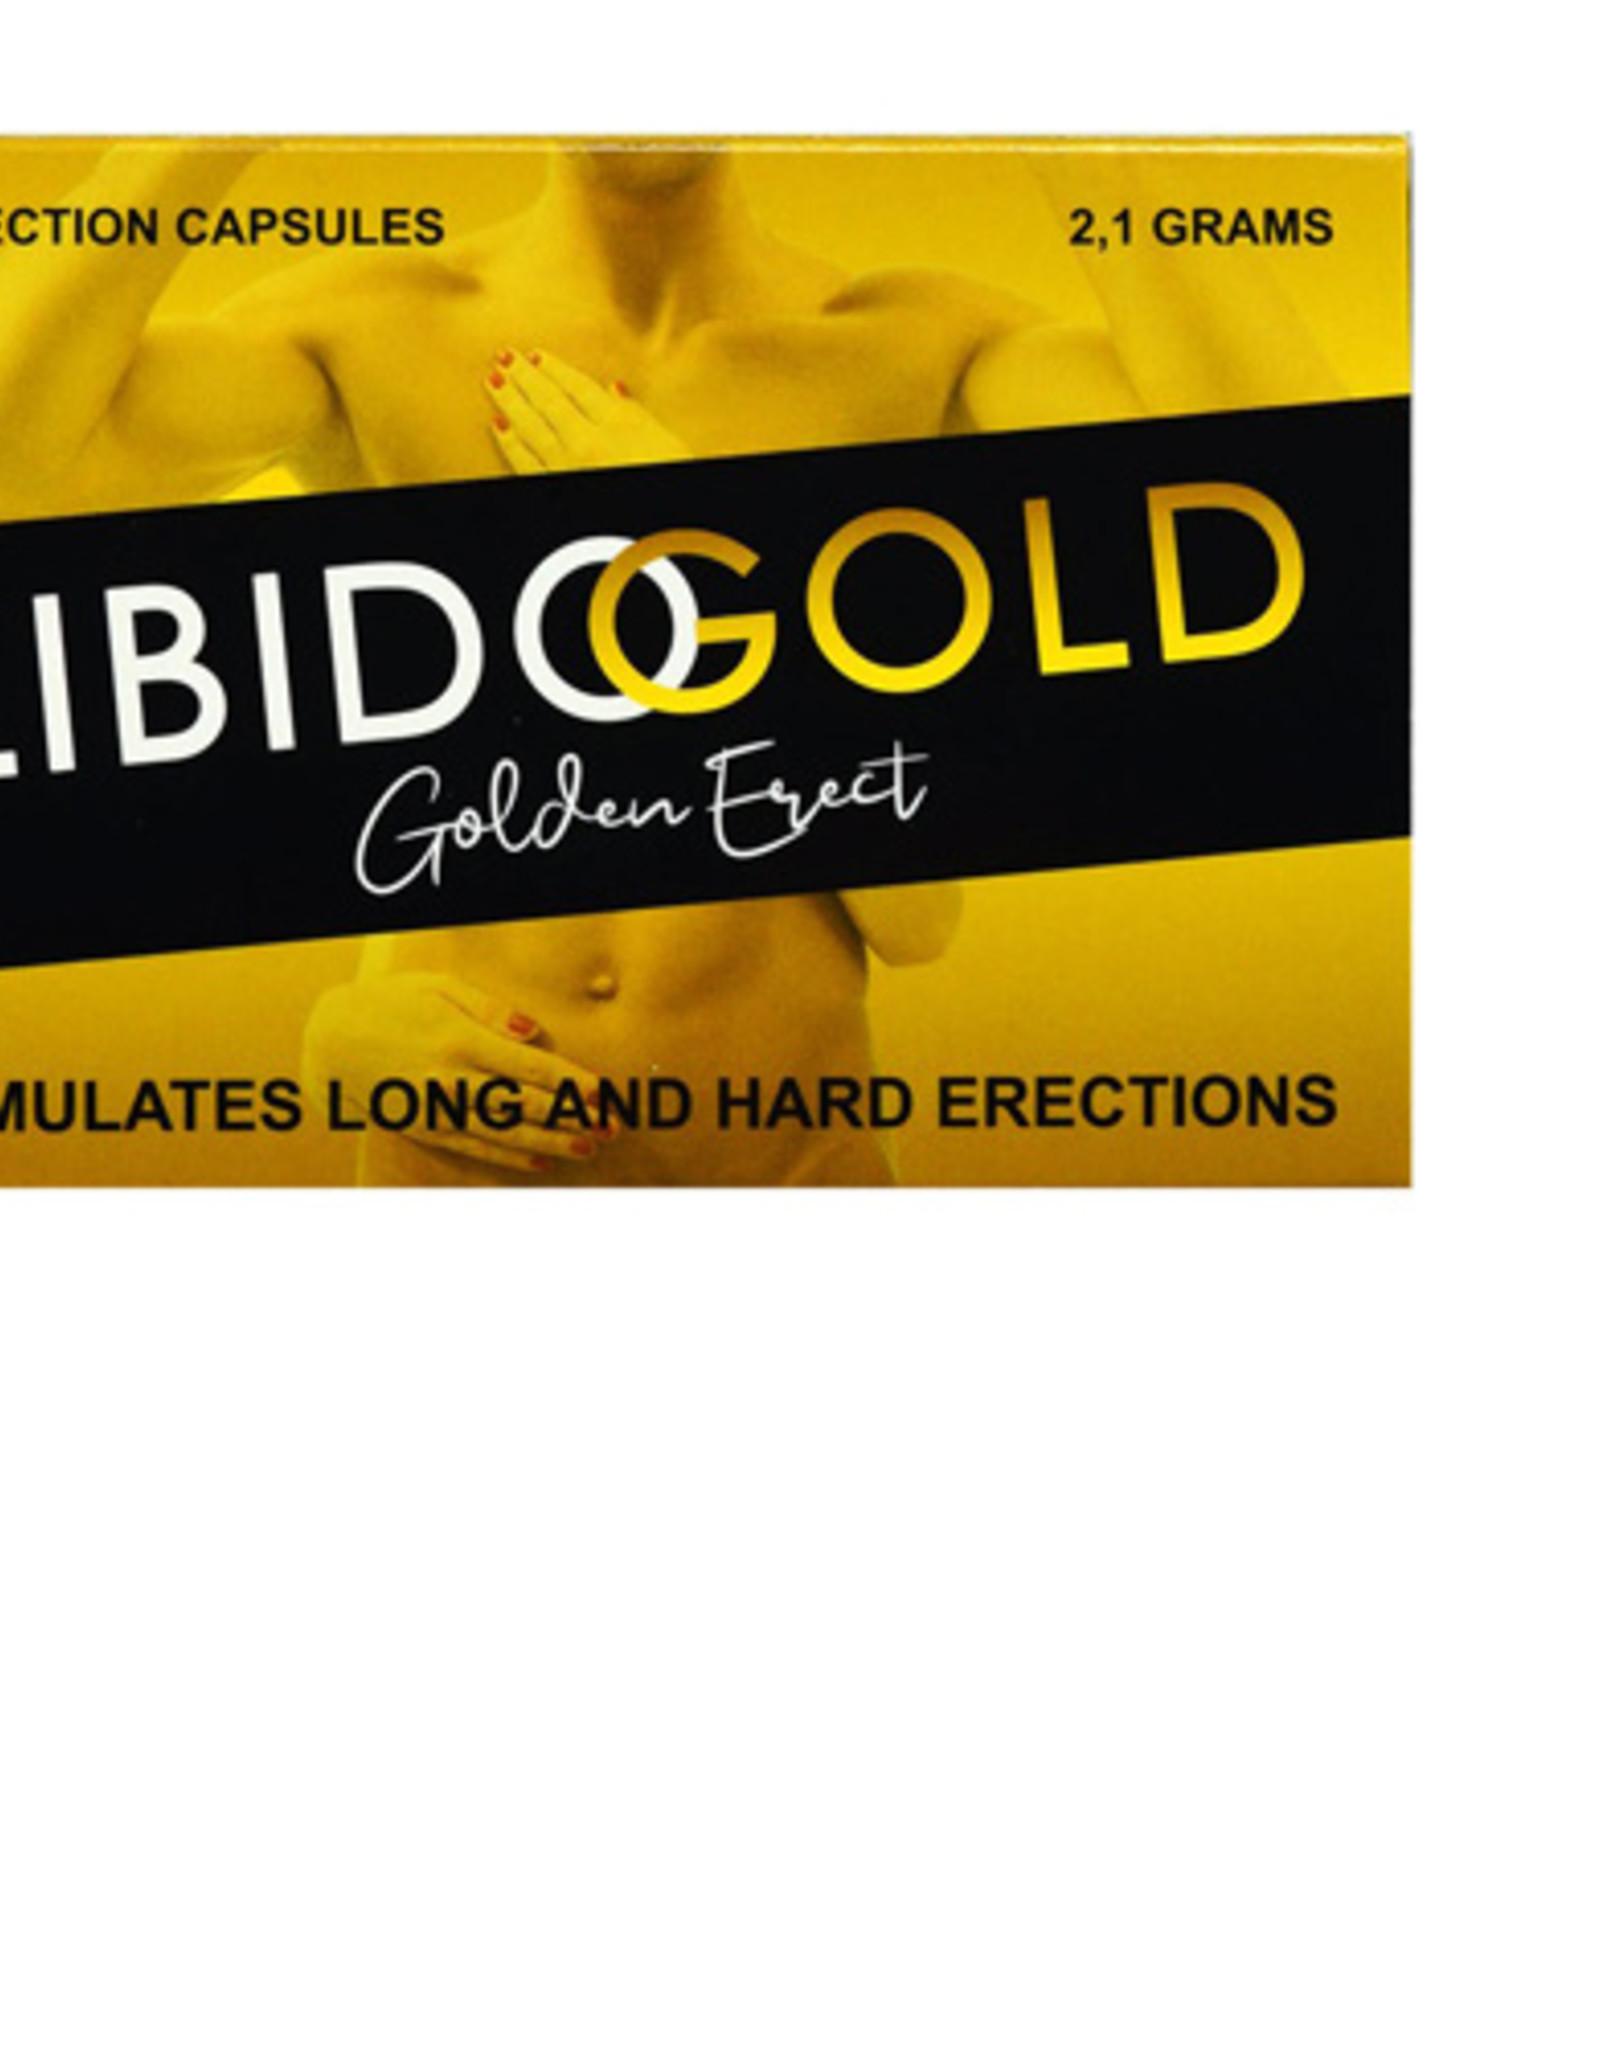 Morningstar Libido Gold Golden Erect